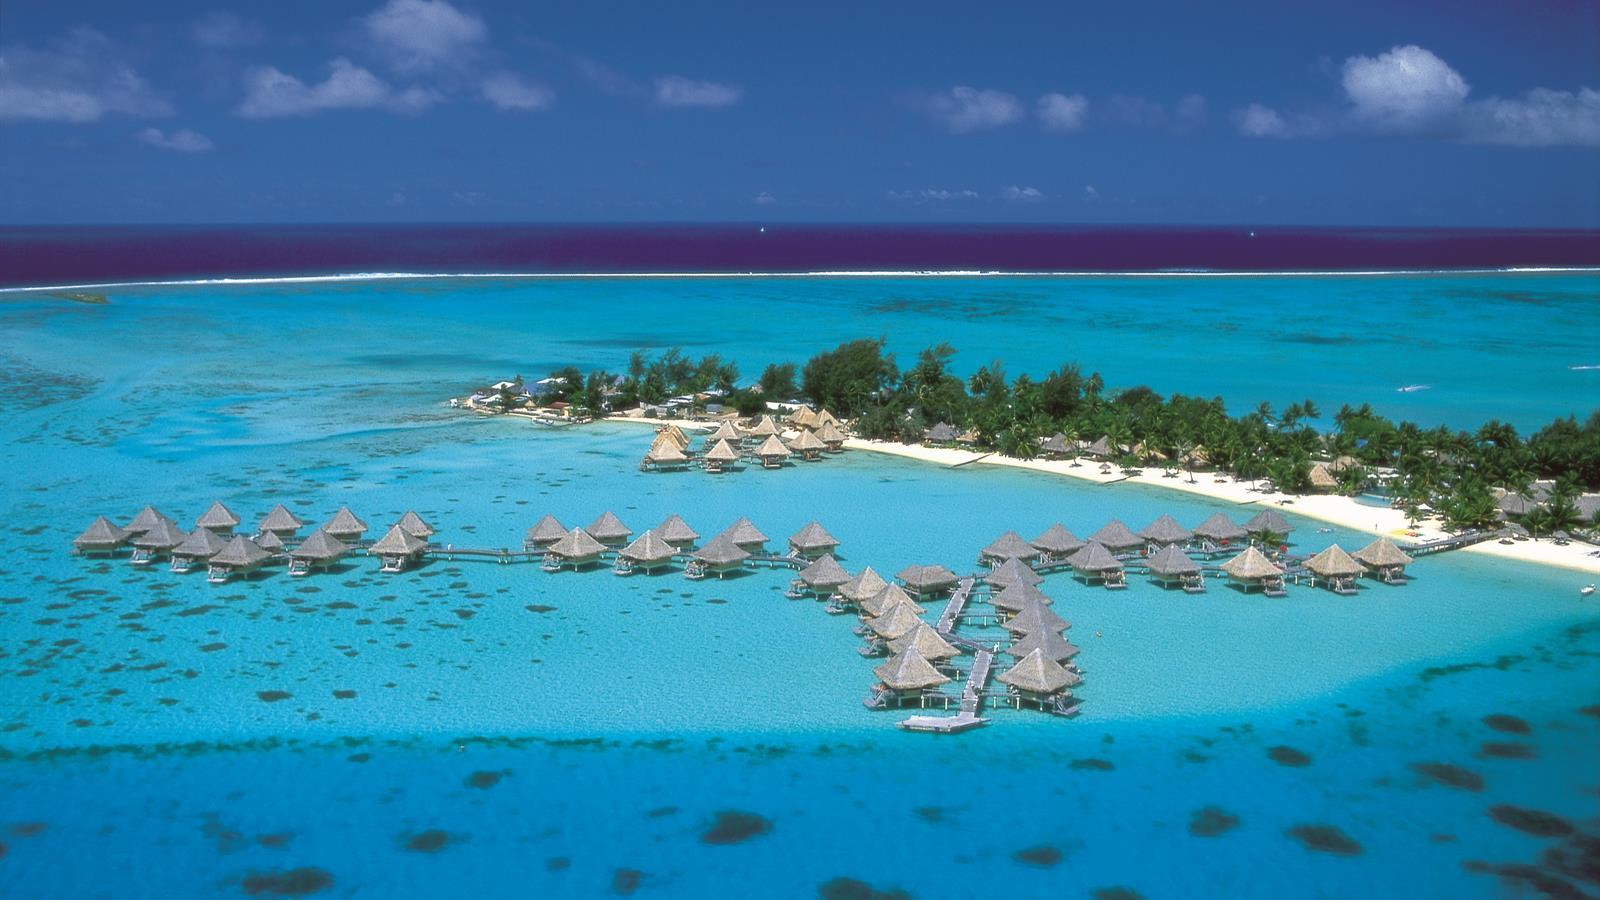 Hotel Intercontinental Bora Bora Booking